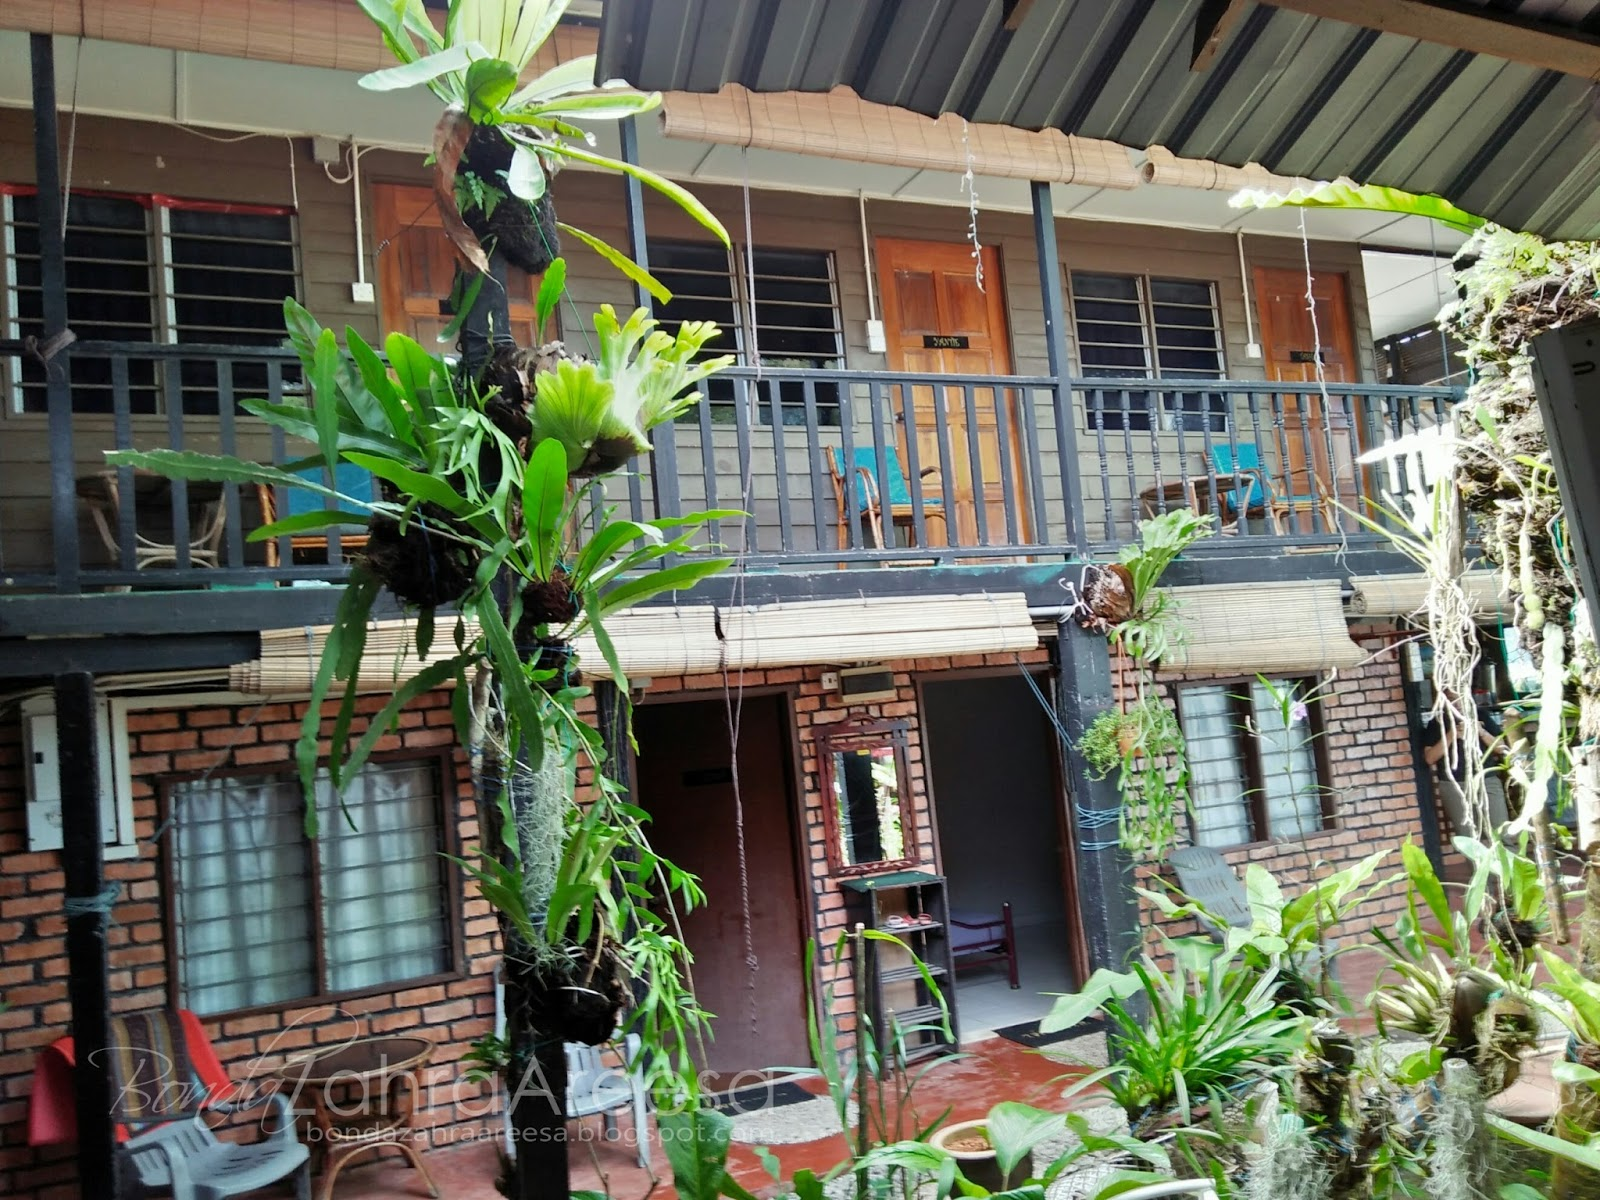 Ali Guesthouse, guesthouse batu feringghi